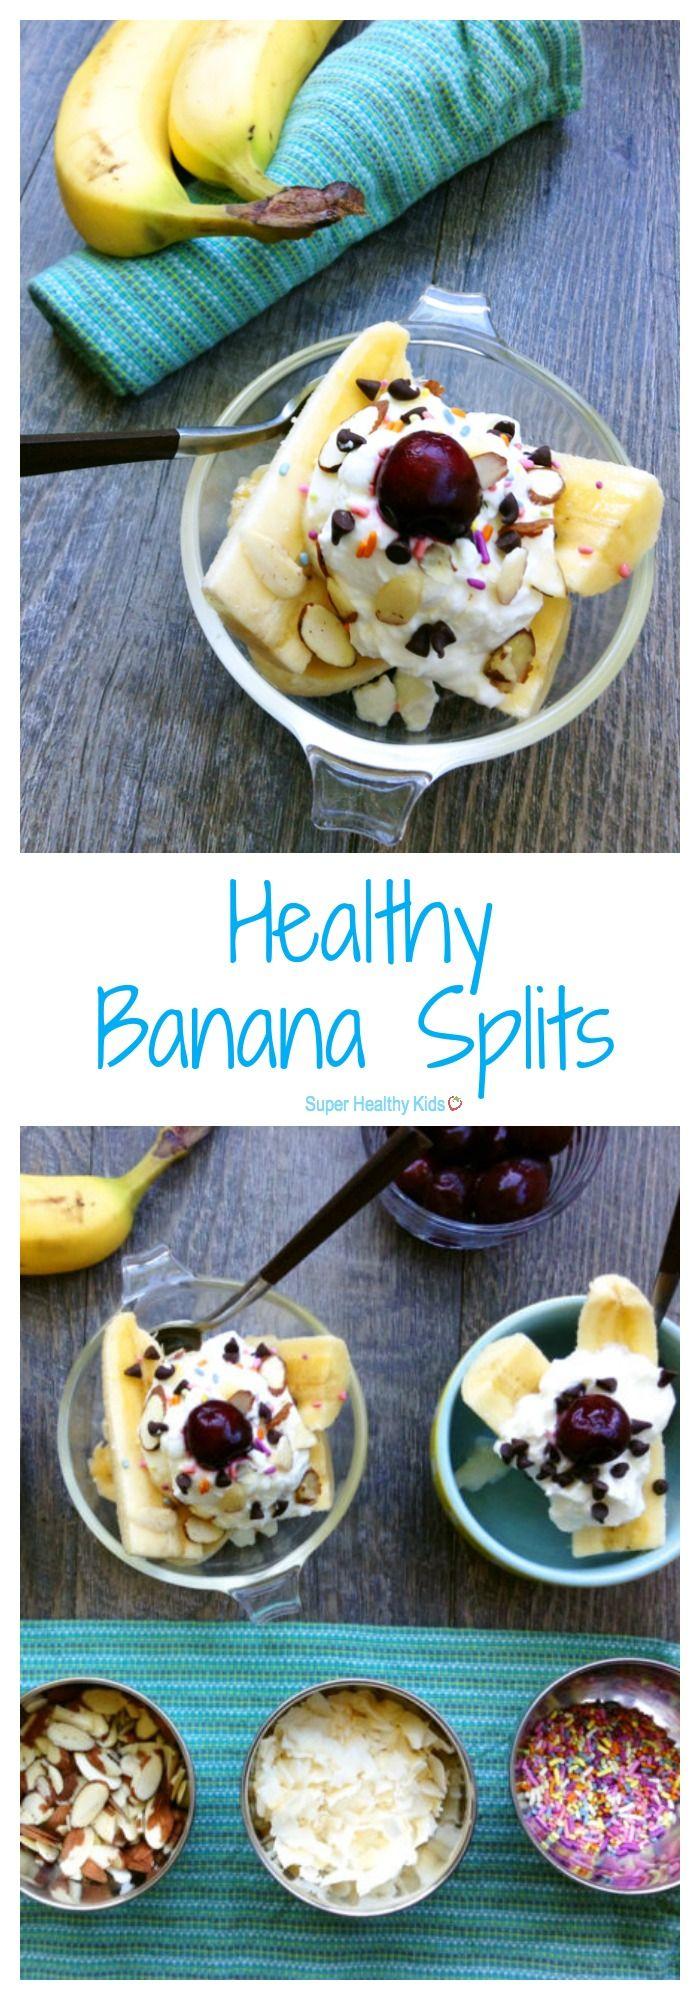 FOOD - Healthy Banana Splits. Turn a traditionally-decadent dessert into a healthful snack with whole milk yogurt, fruit, seeds and dark chocolate chips! http://www.superhealthykids.com/kids-favorite-healthy-banana-split/